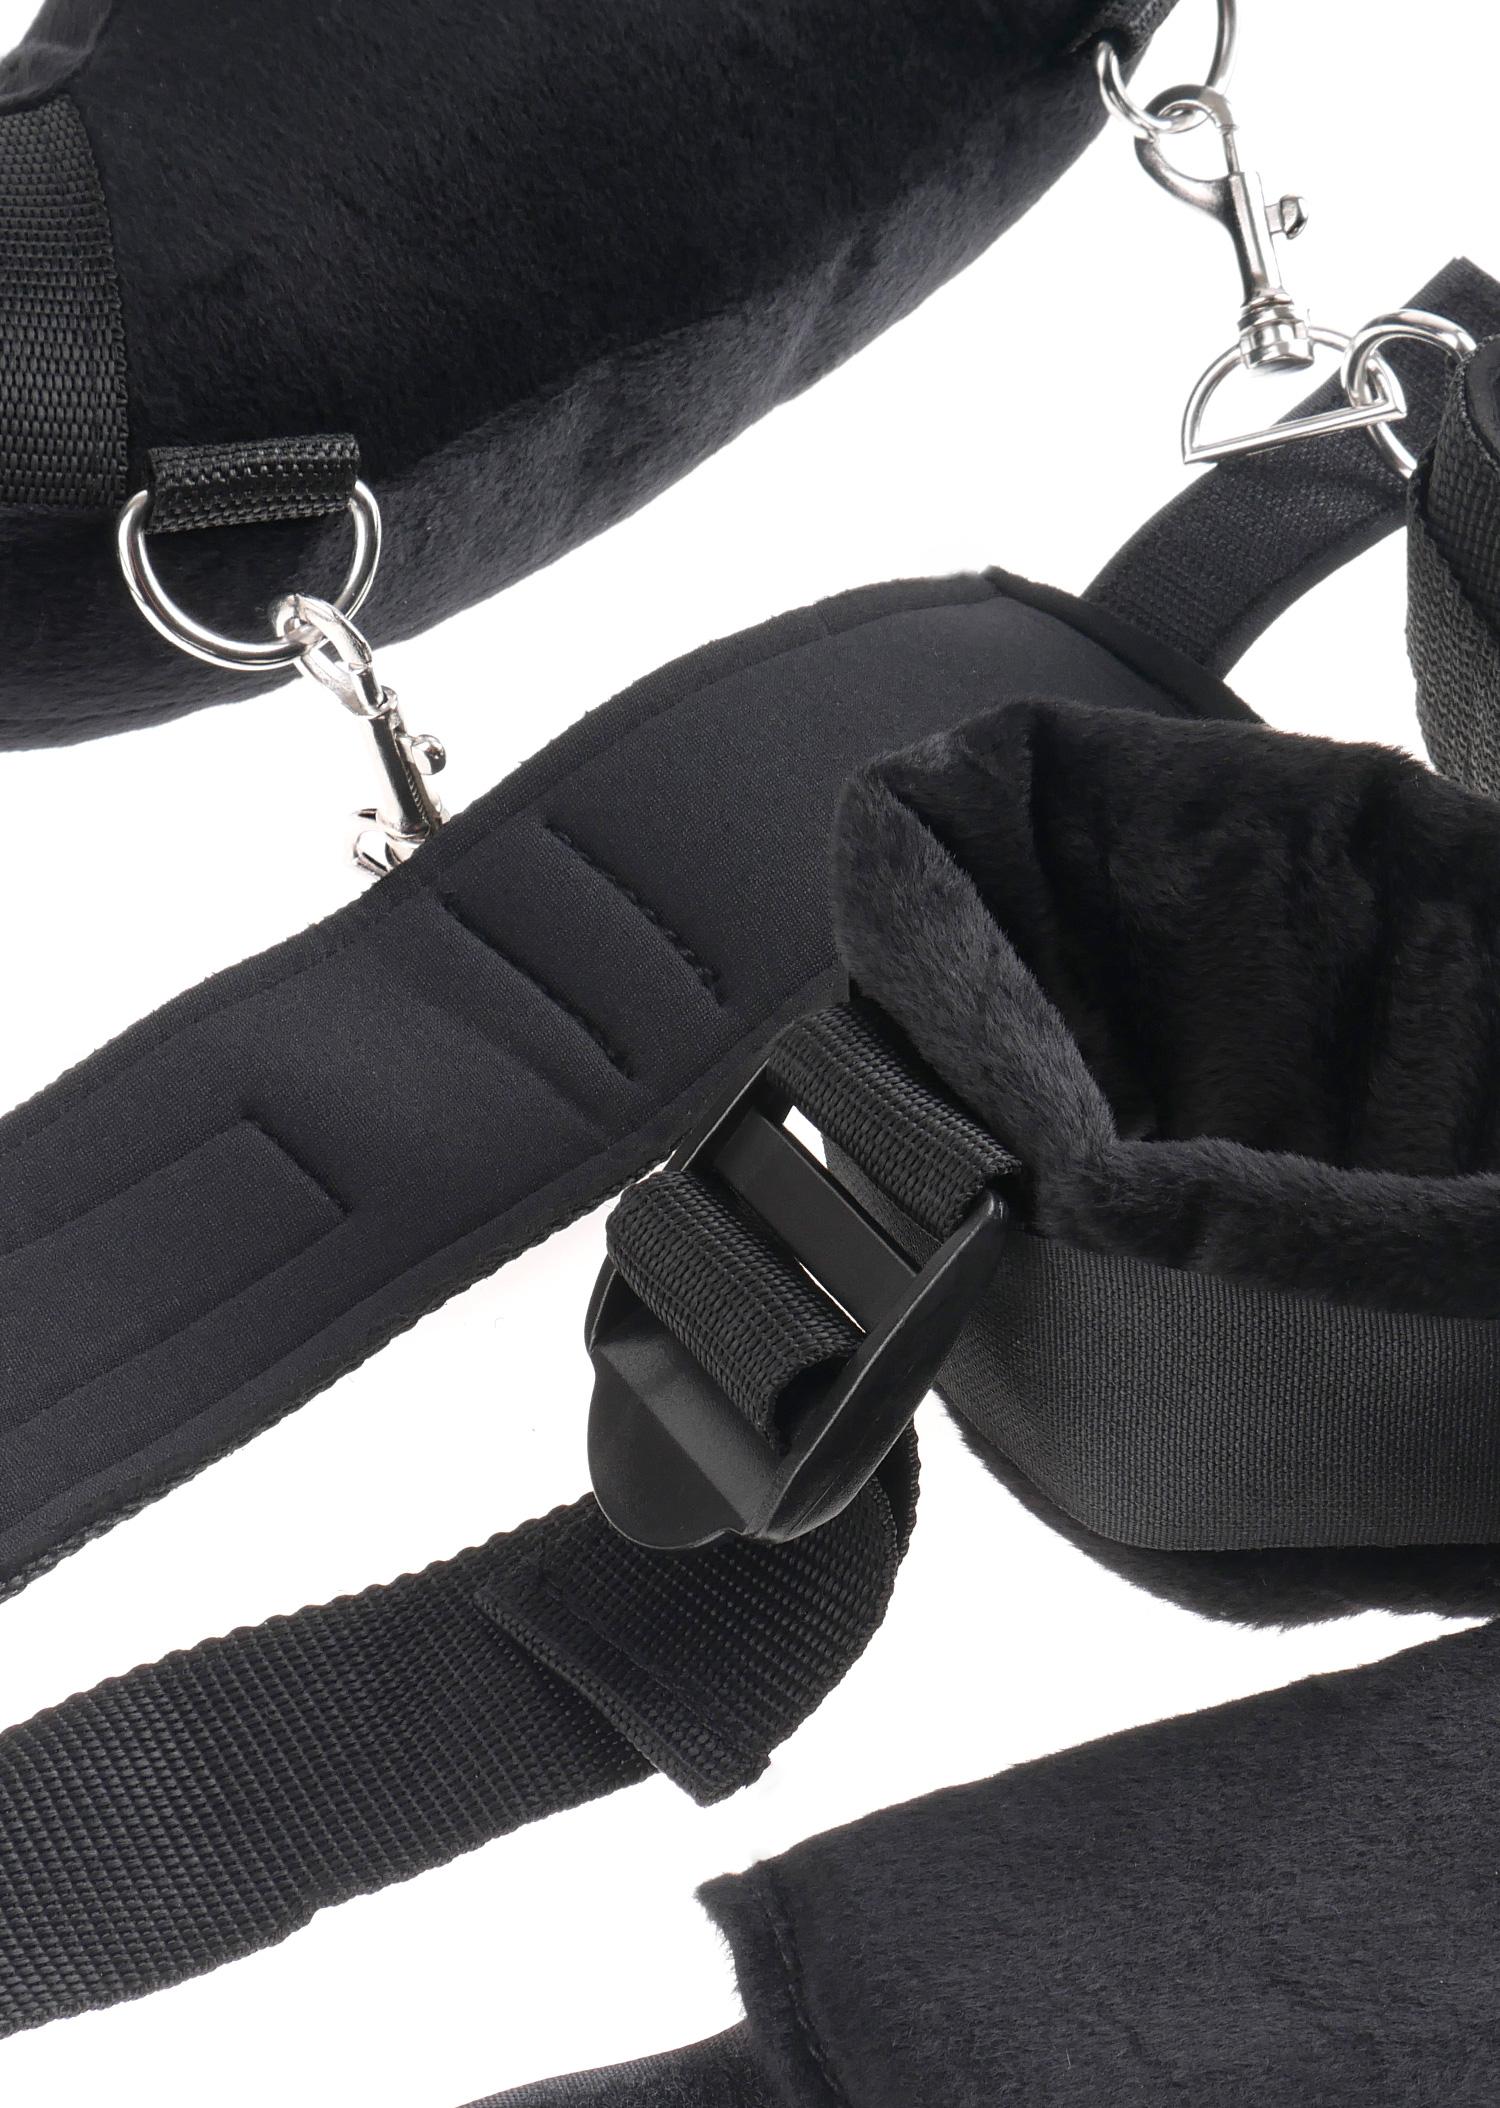 фетиш фантазия - Position Master With Cuffs — 2